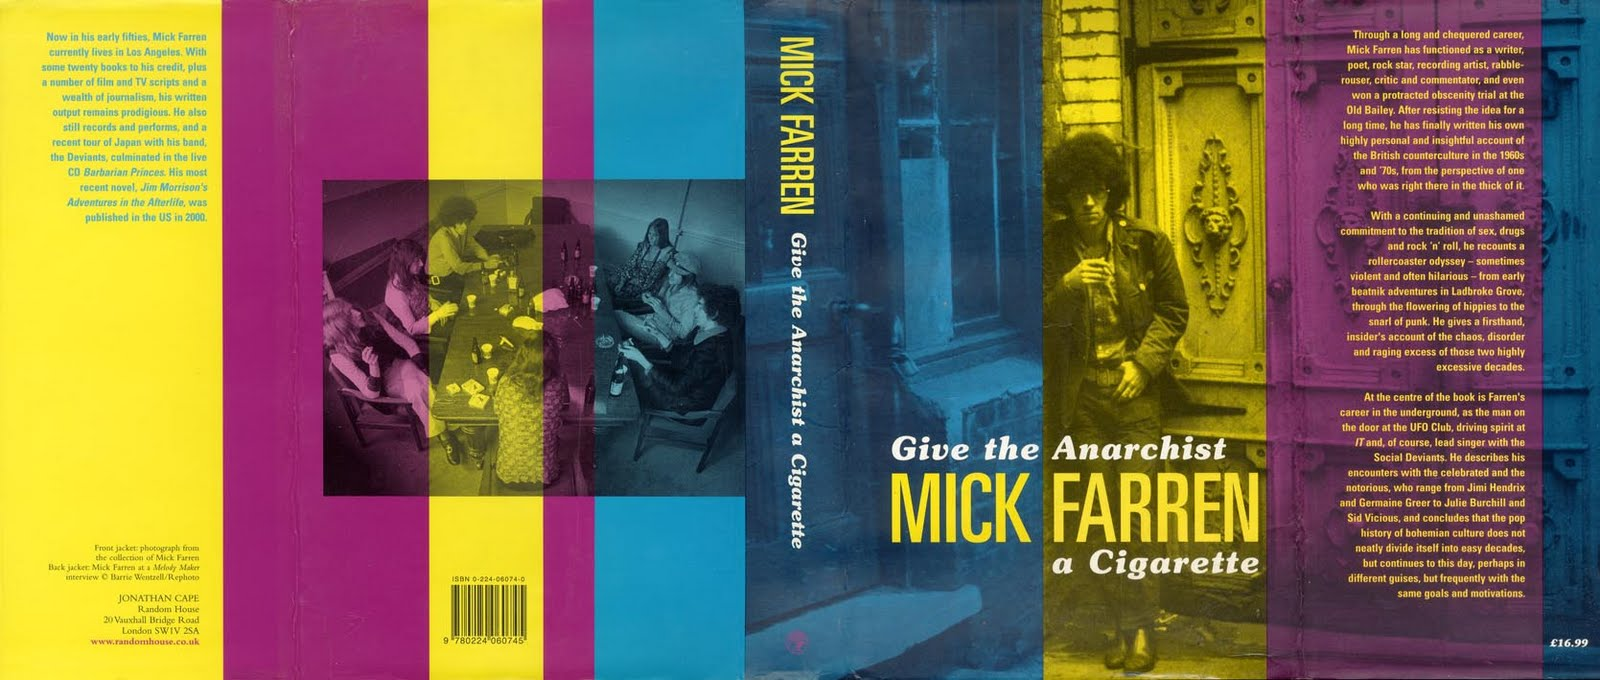 http://2.bp.blogspot.com/-Xc-V1YmG9tk/Tjs326T3BdI/AAAAAAAAUzk/ohkQmewXLns/s1600/Cape+Farren+Give+the+Anarchist+a+Cigarette.jpg